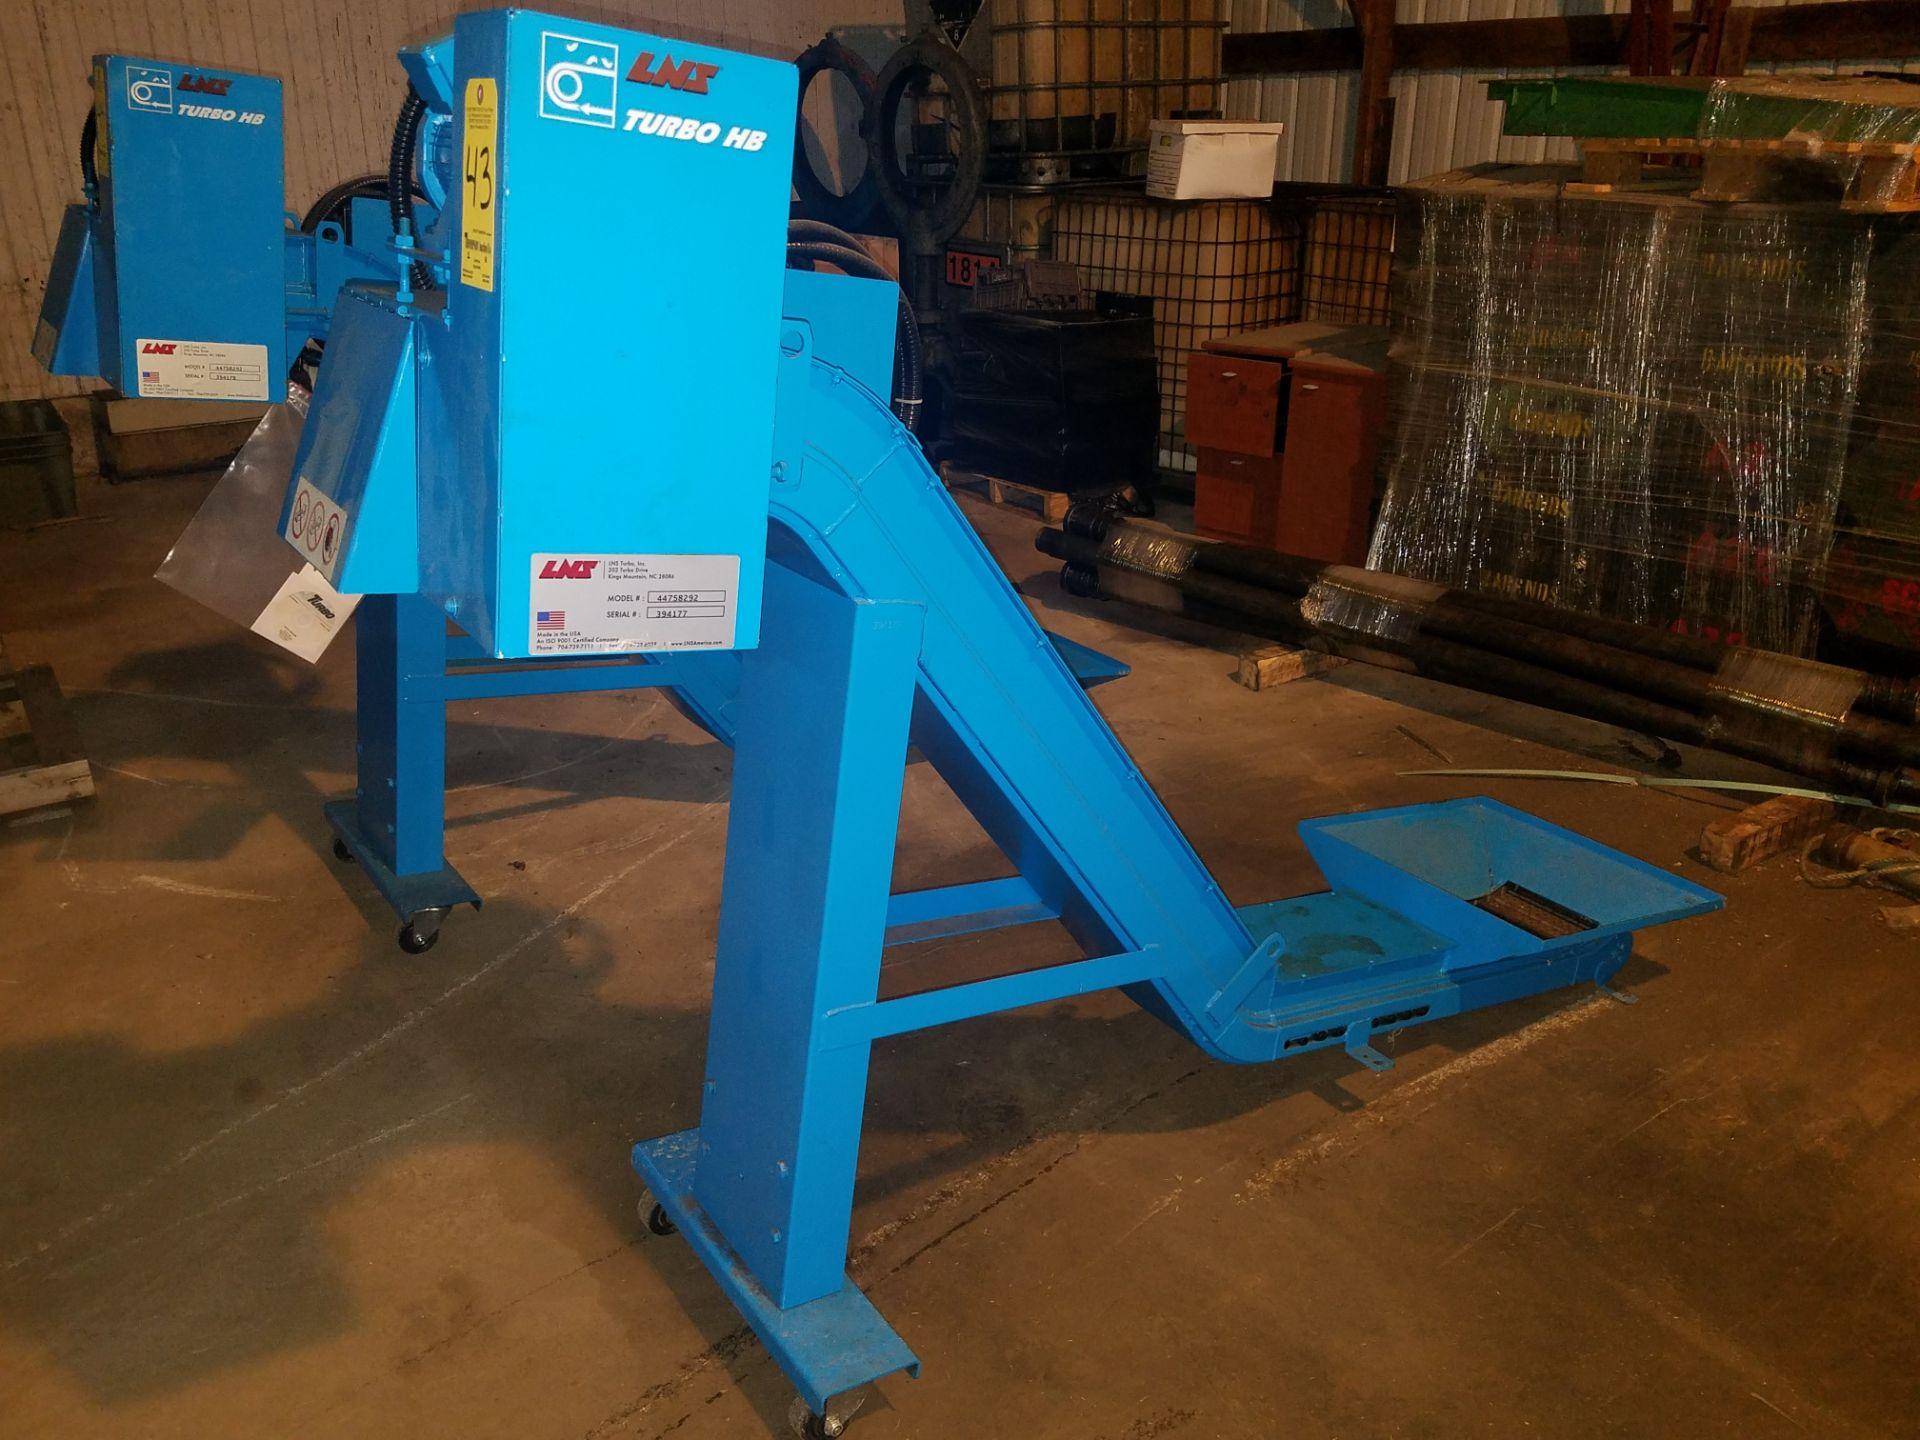 Lotto 43 - LNS Turbo Chip Conveyor, Model 44758292, s/n 394177, Like New